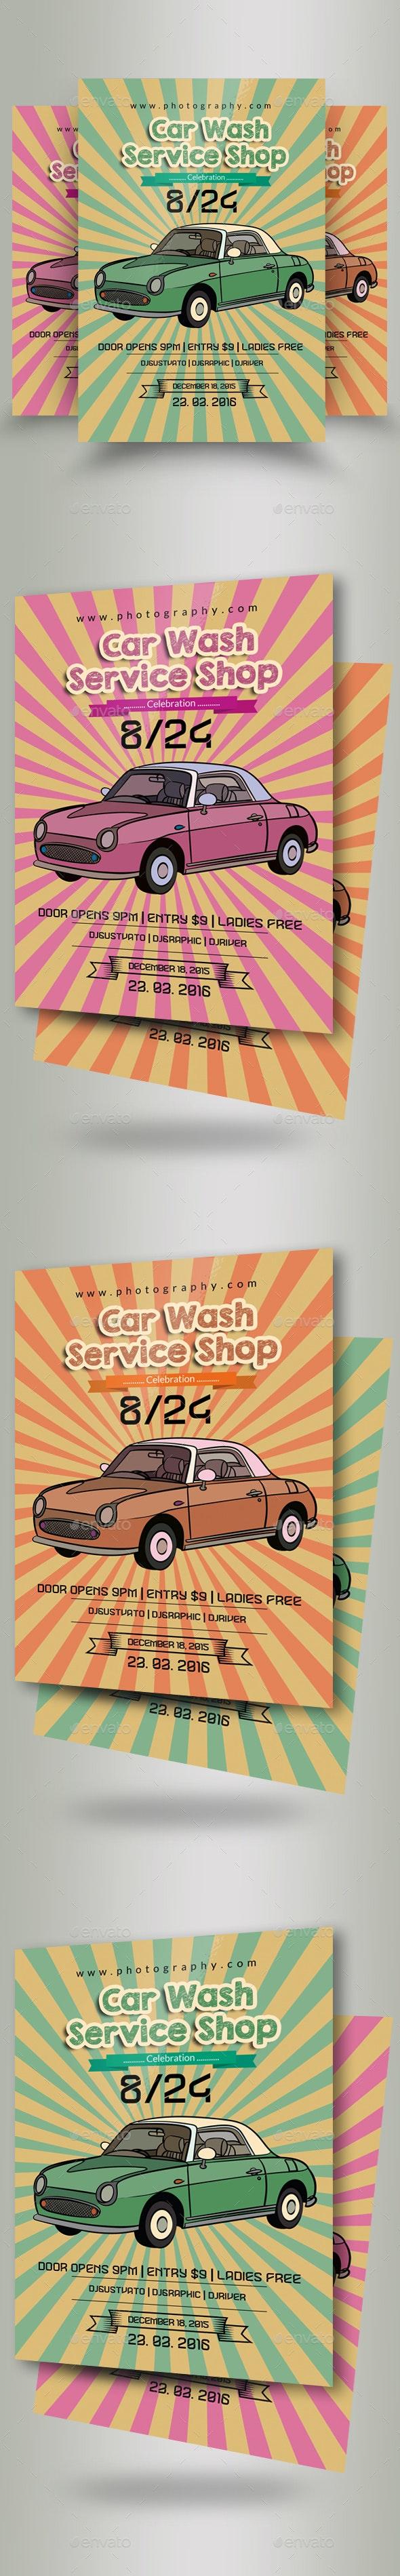 Car Wash Flyer Template - Flyers Print Templates